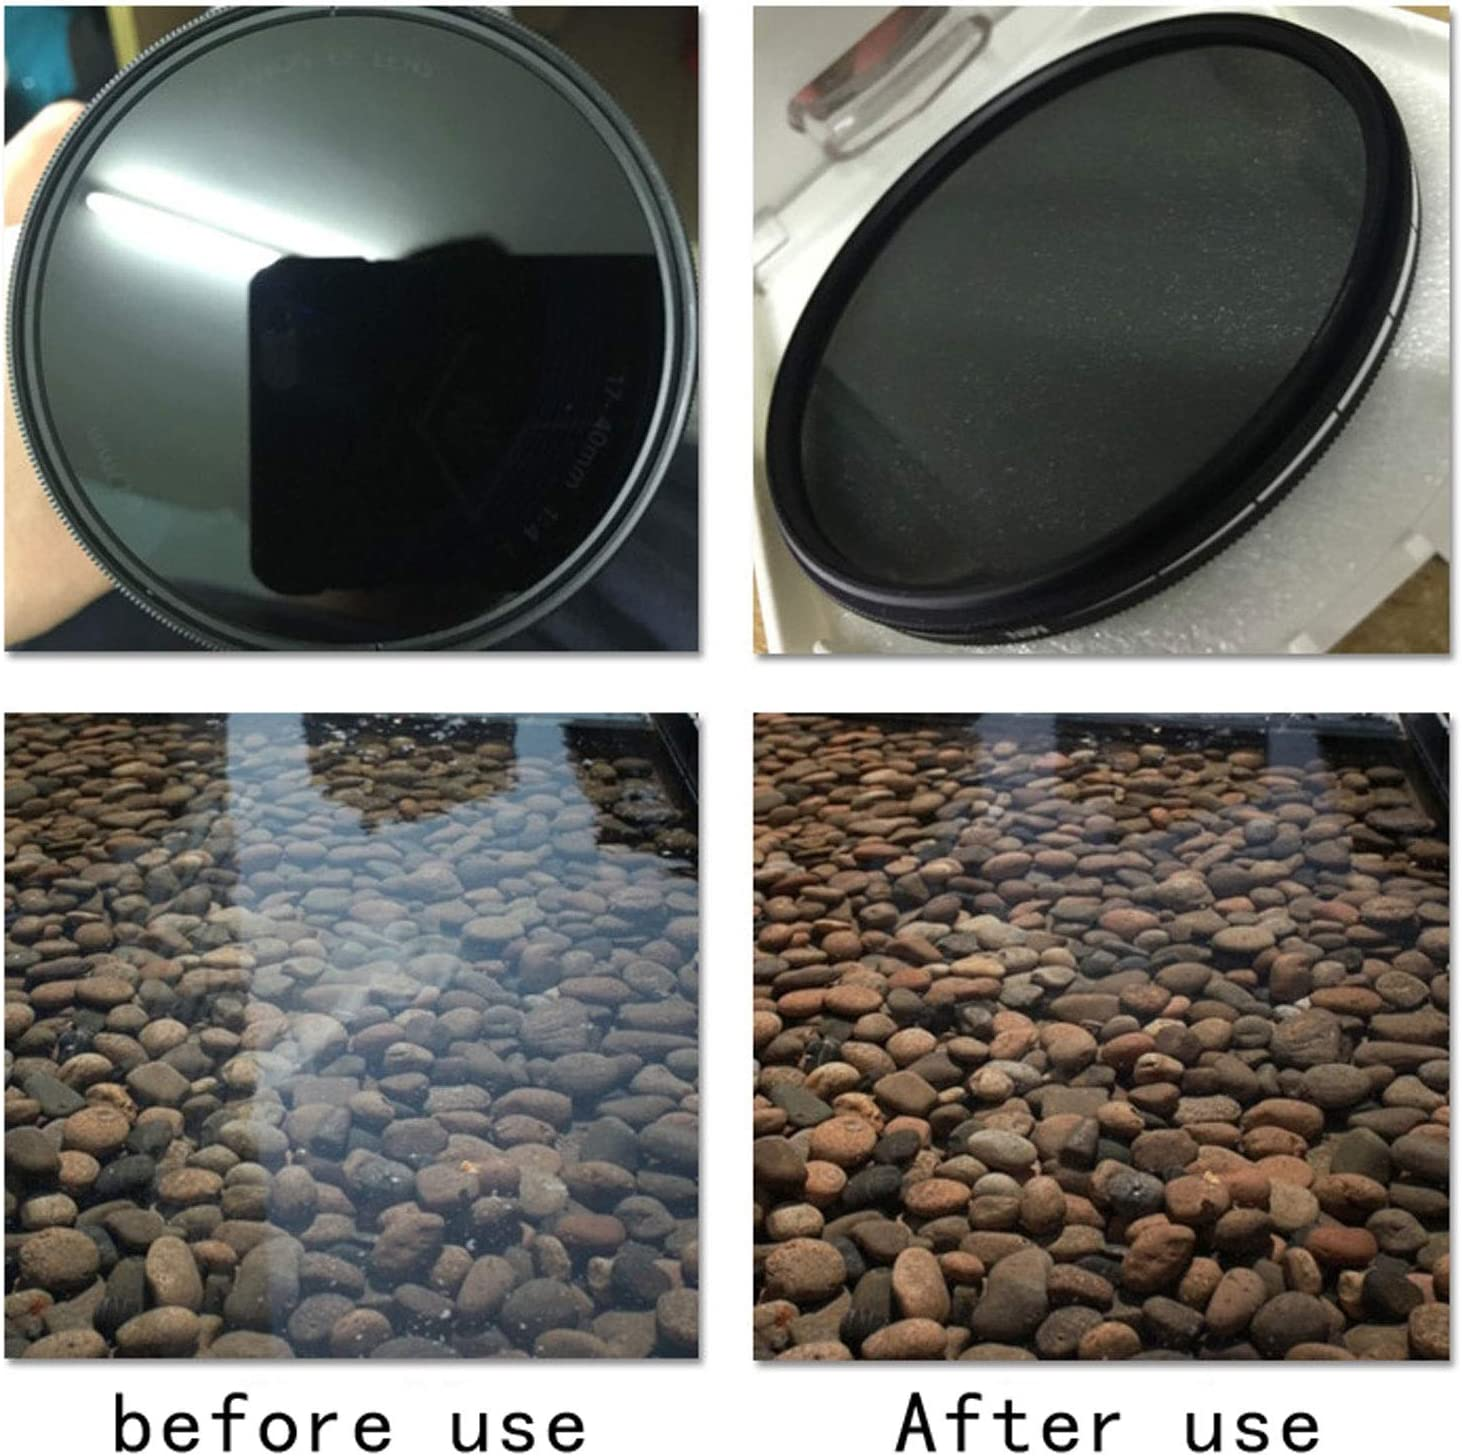 Size : 67mm Wangclj Filter Lens Polarization Filter Ultra-Thin CLEARPRO-CPL Ultra-Thin HD Rubber